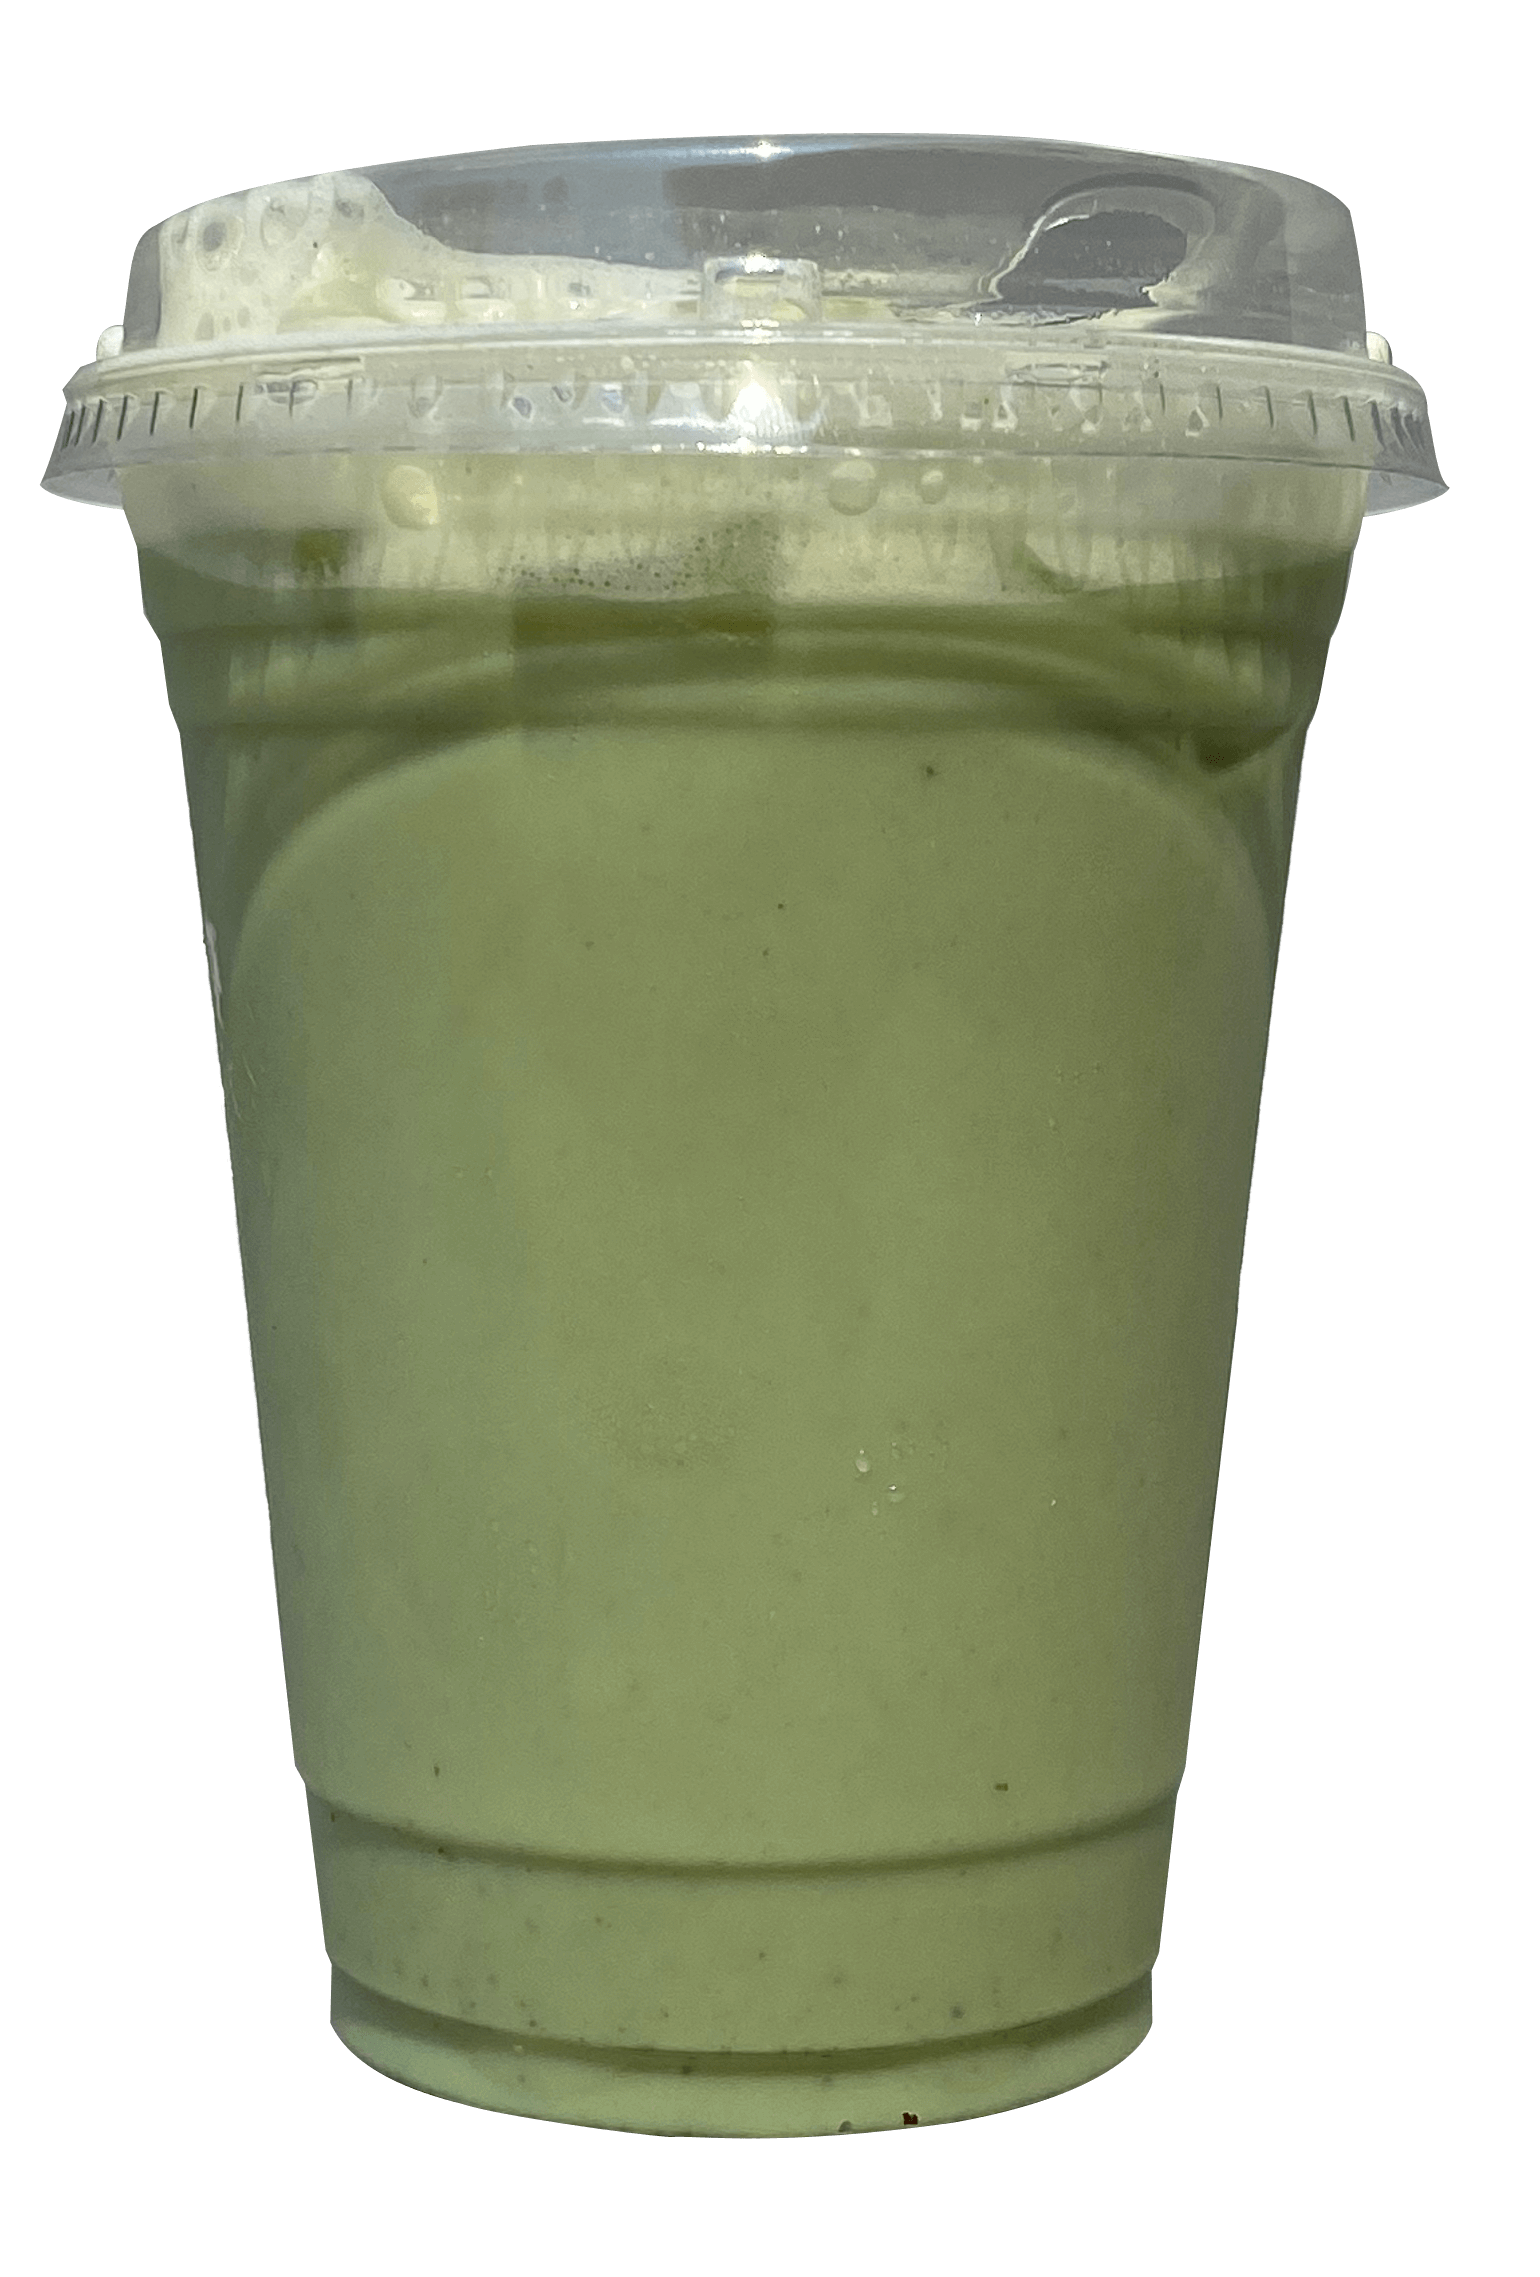 The Iced Matcha Latte